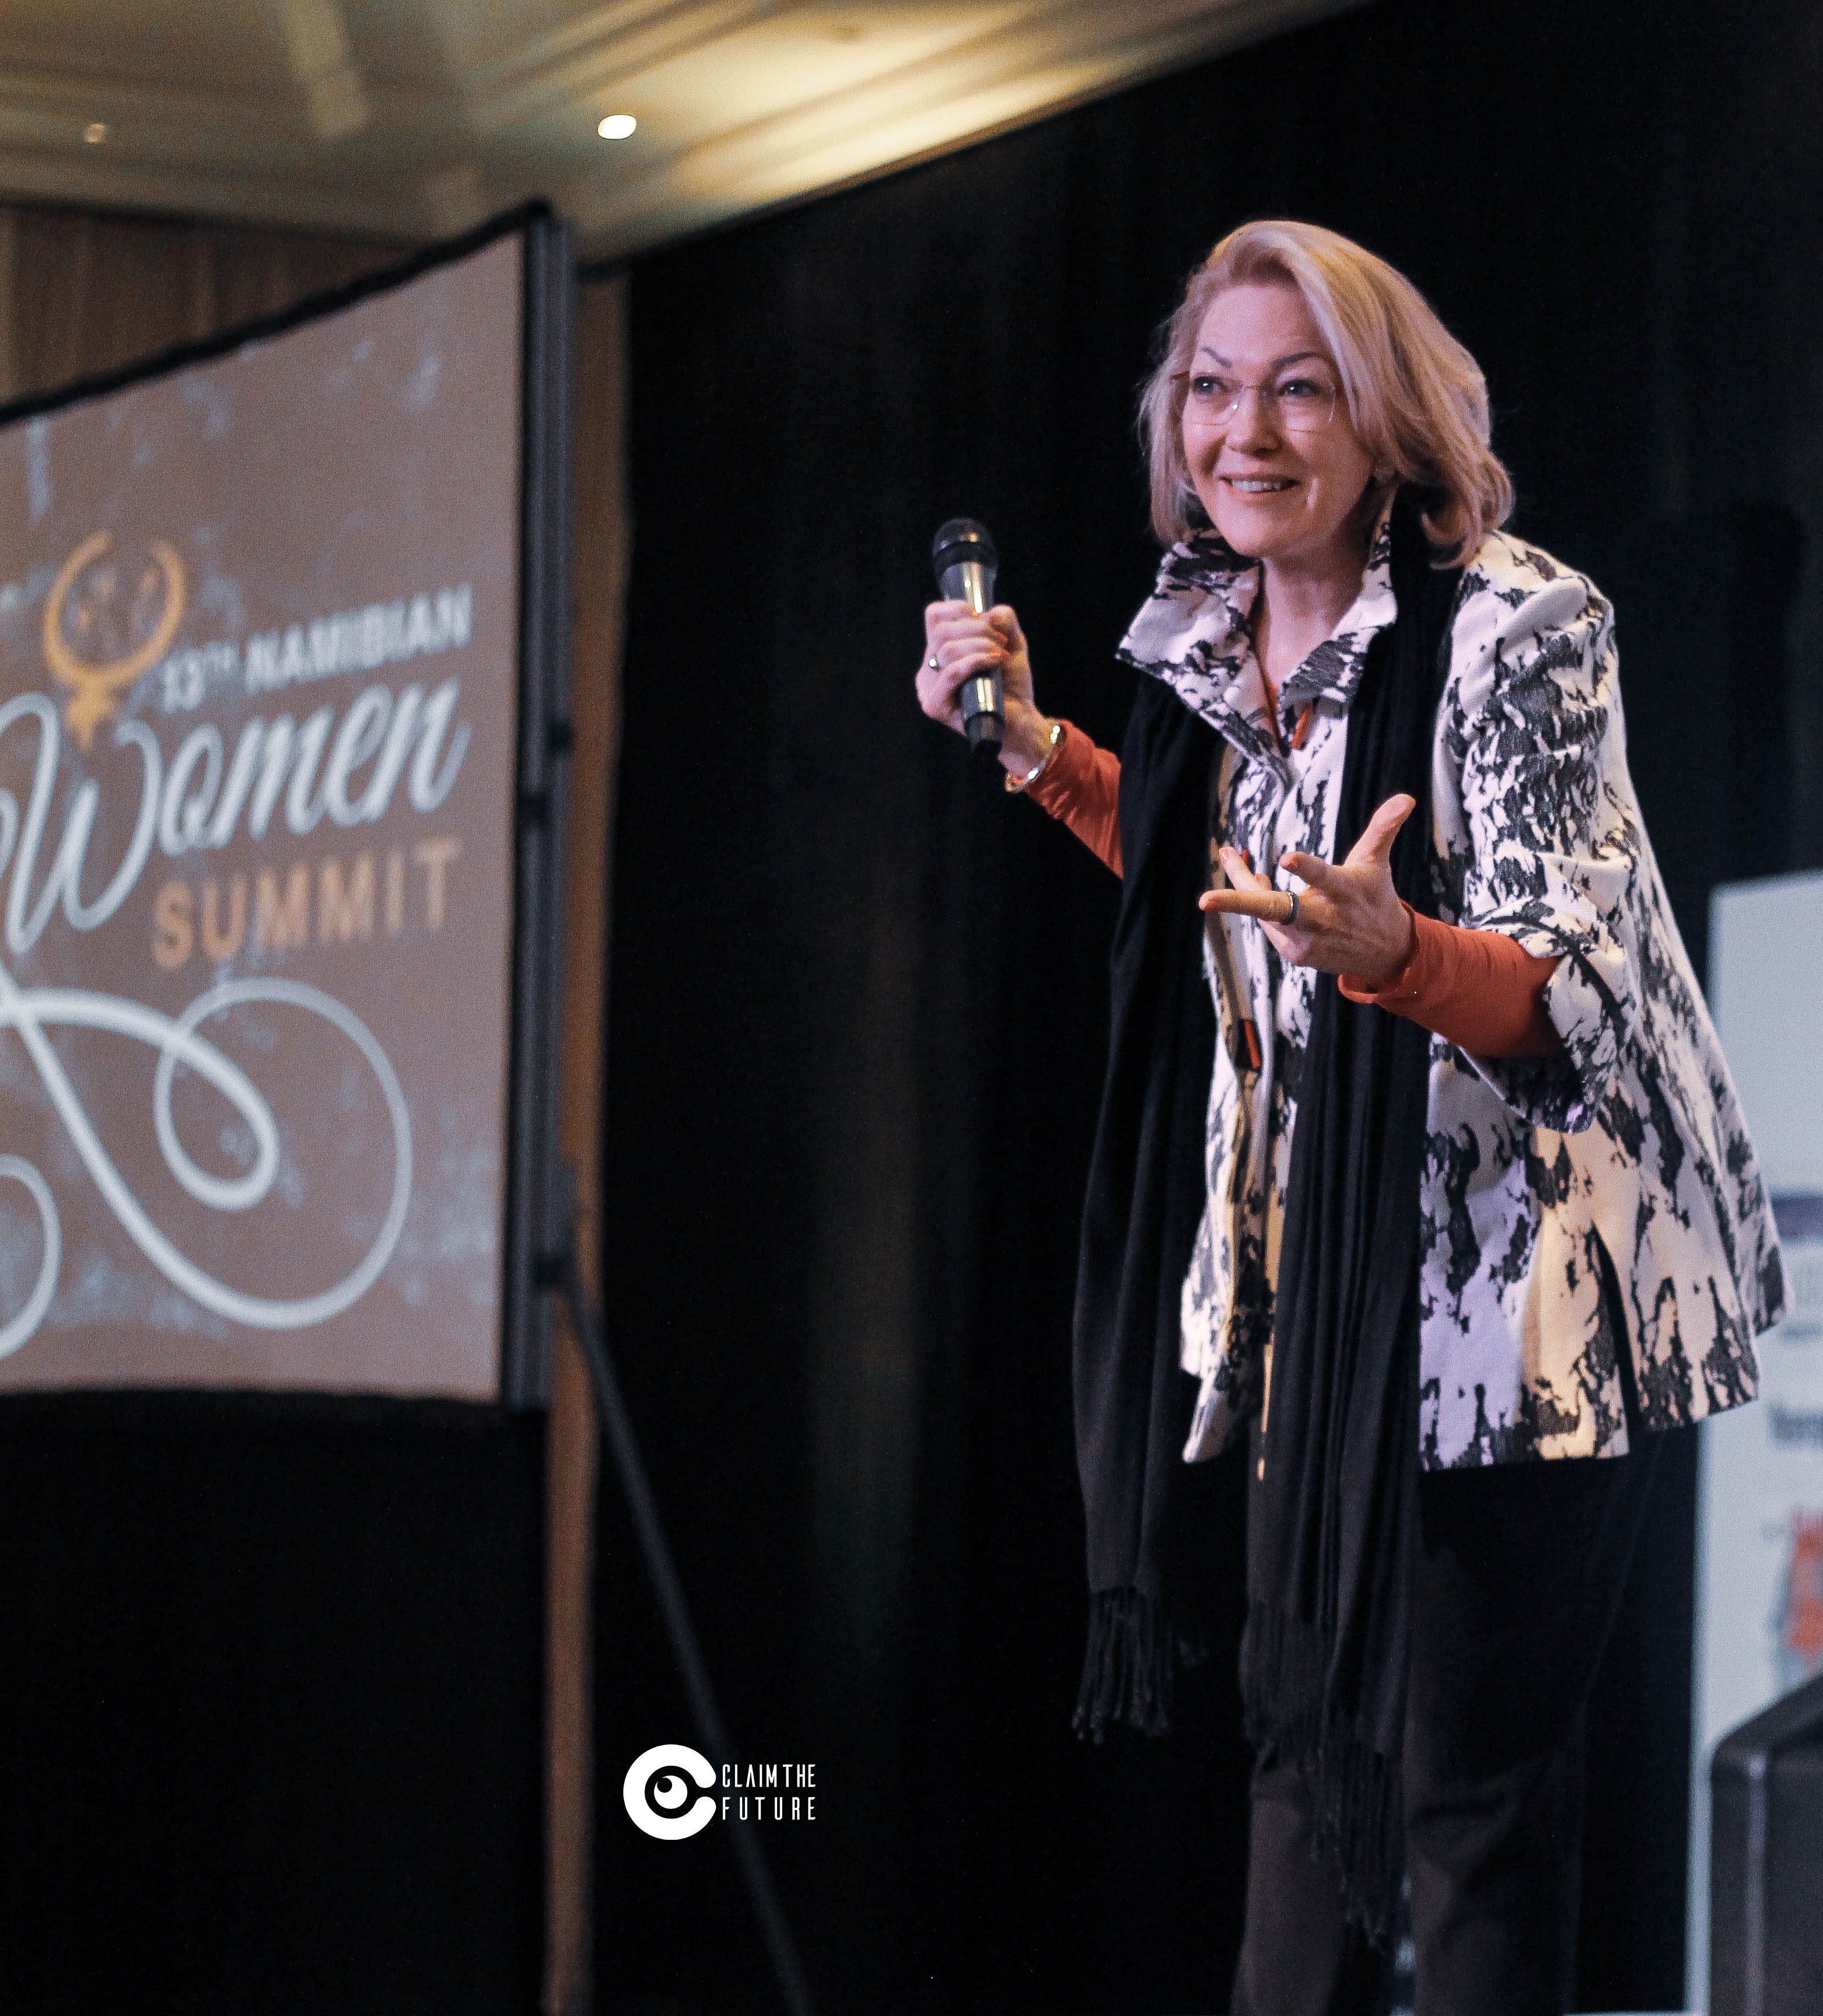 Linda Scott Women's Summit August 2019 3